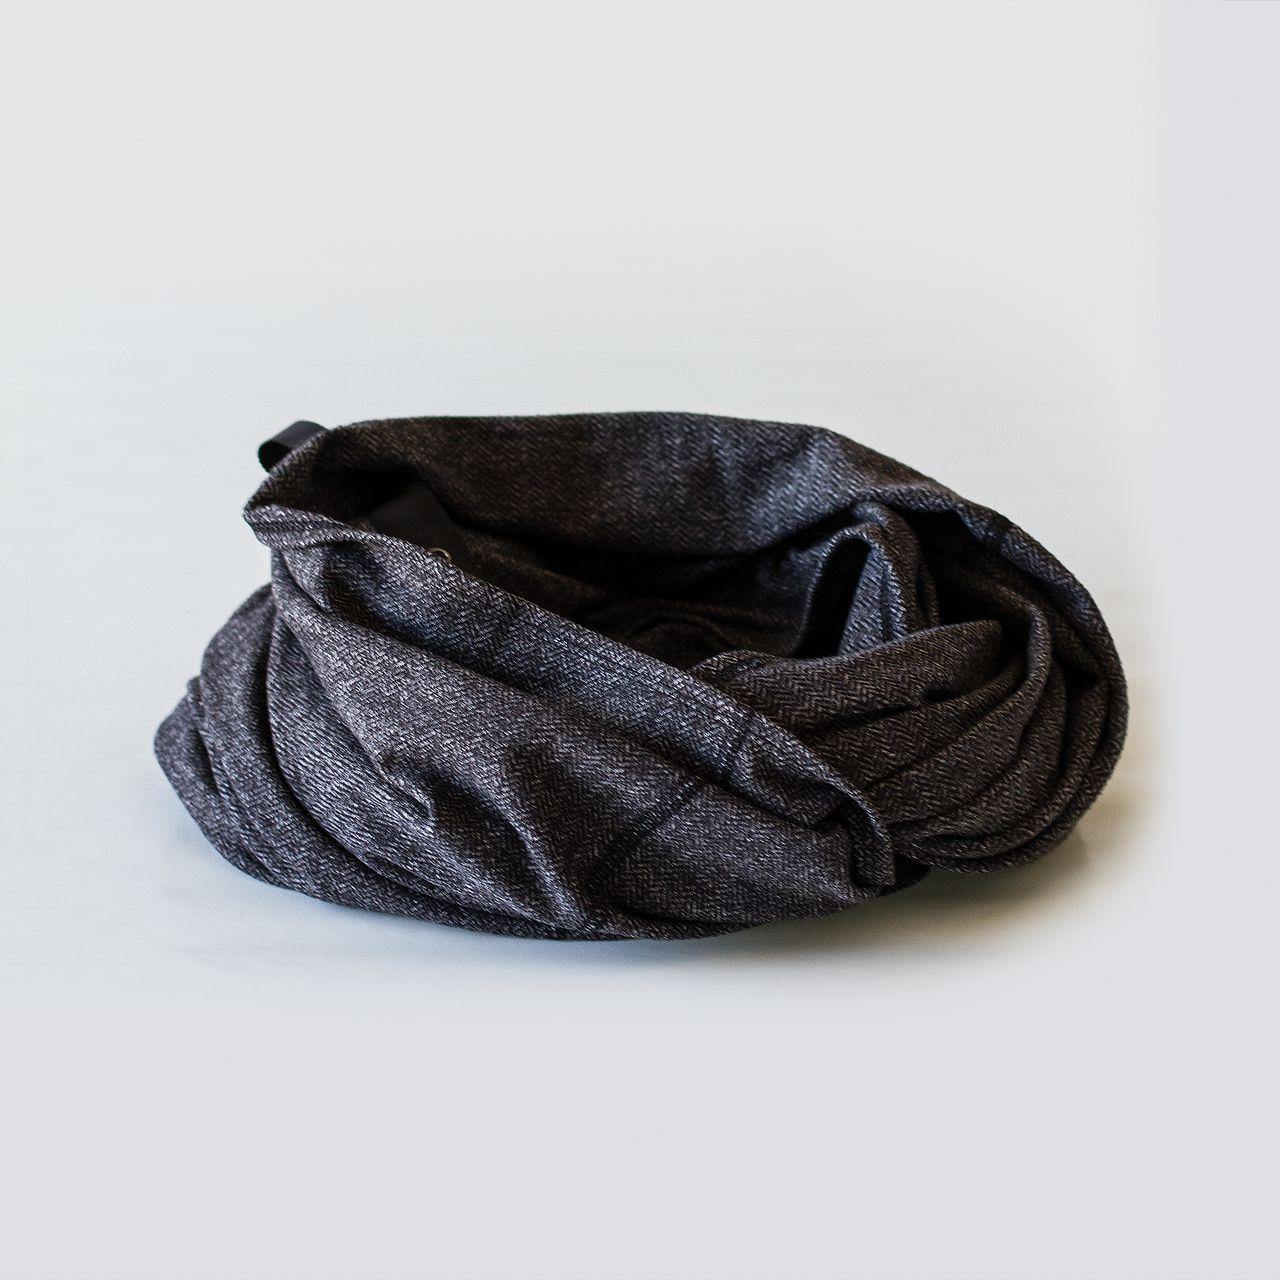 Lululemon Vinyasa Scarf - Black Herringbone